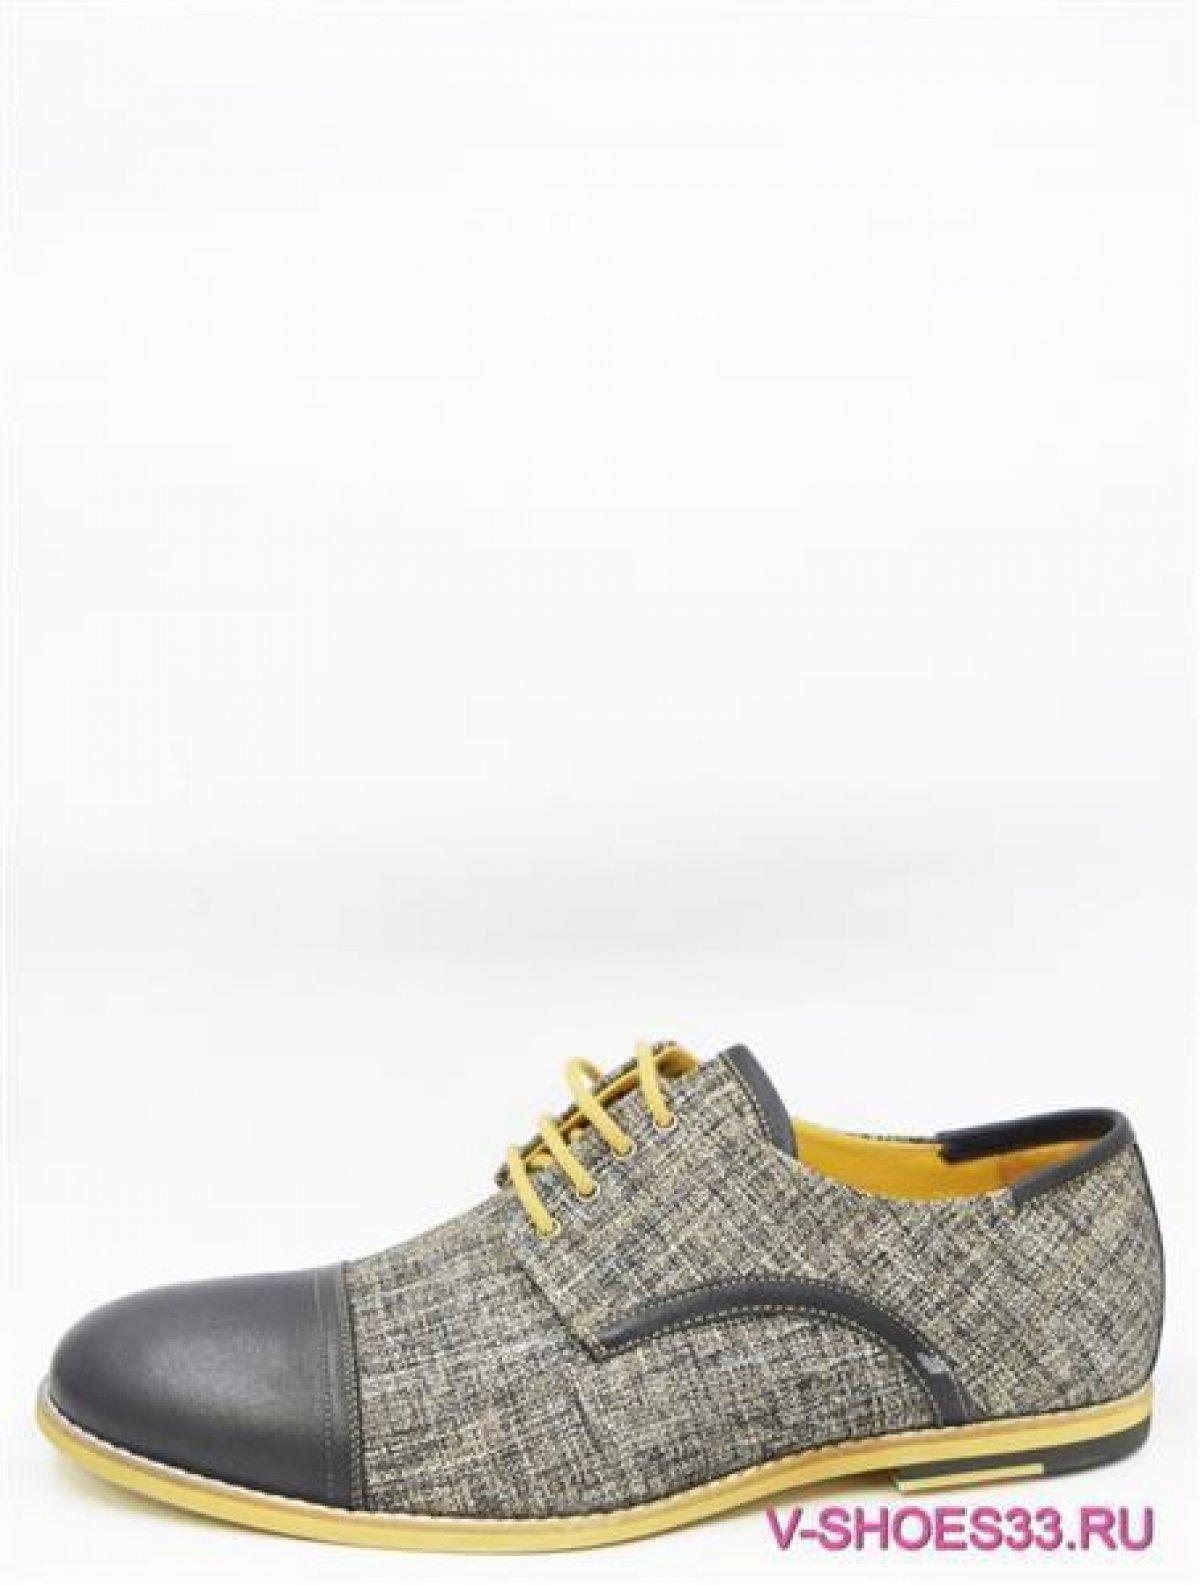 I63-063053 мужские туфли